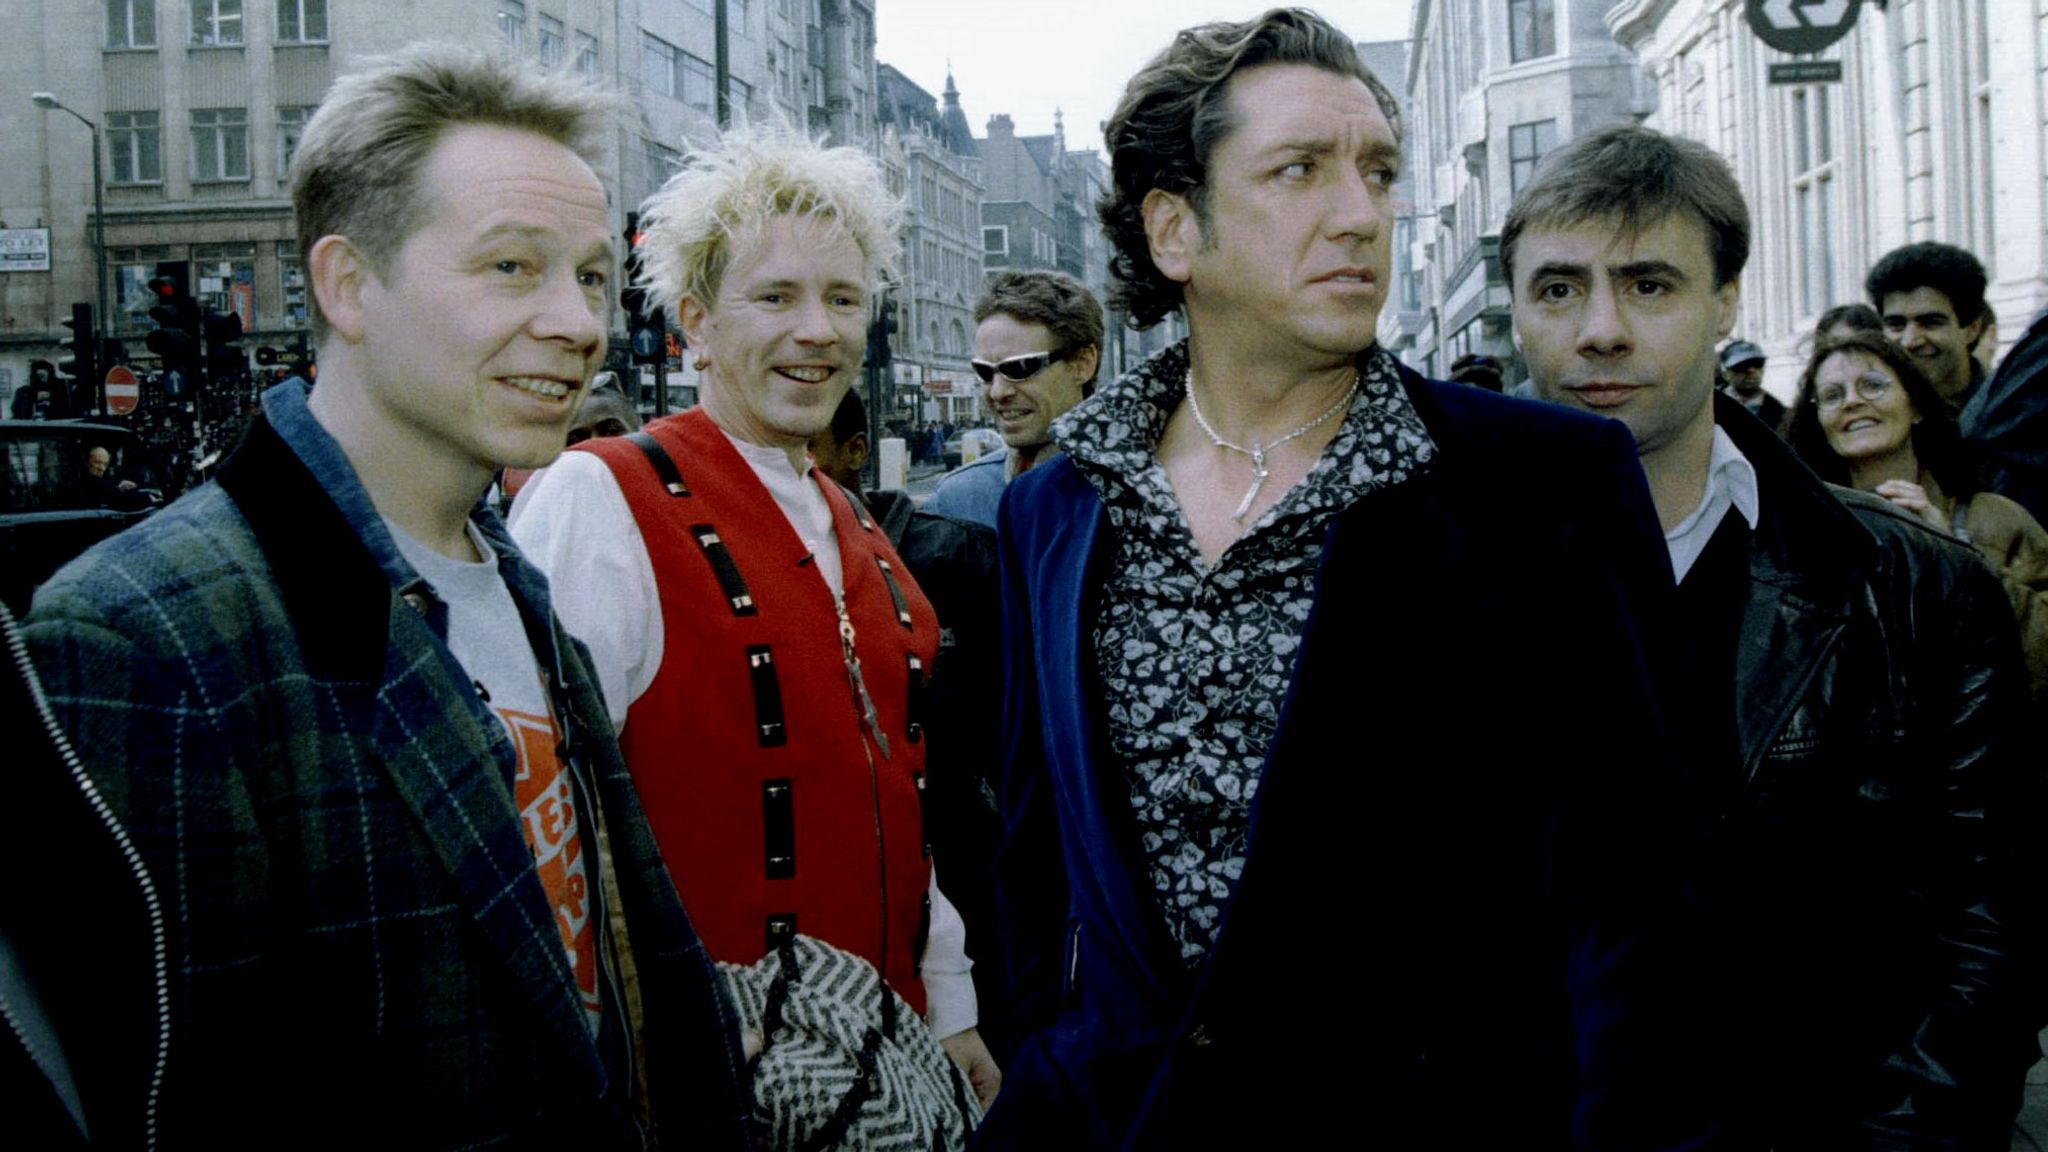 The Sex Pistols (L-R) original line up: Paul Cook, Johnny Rotten, Steve Jones, and Glen Matlock